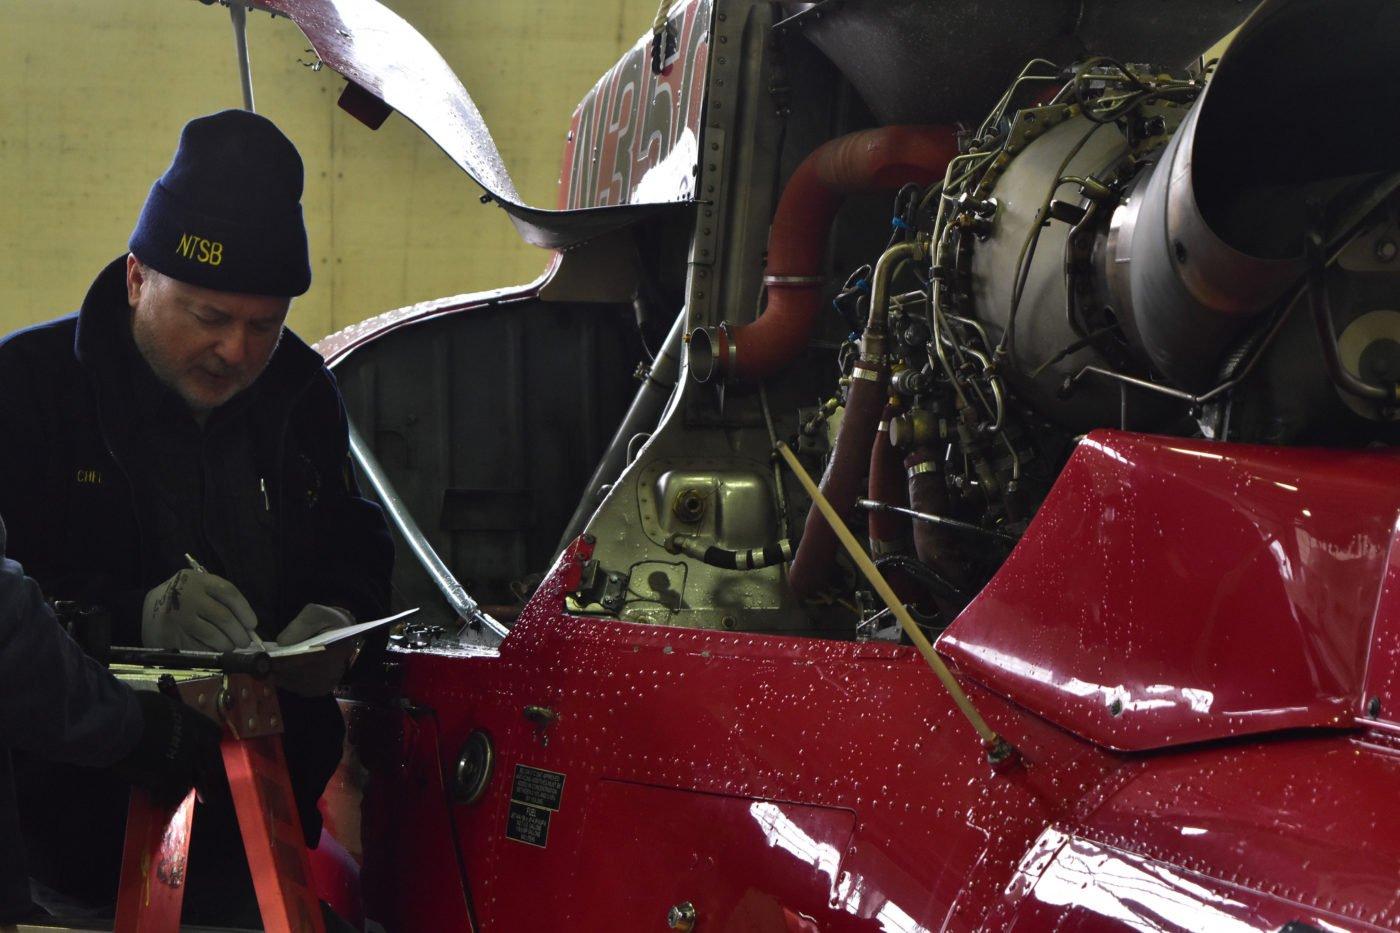 Helicopter Crash Prompts Changes to Door Policy